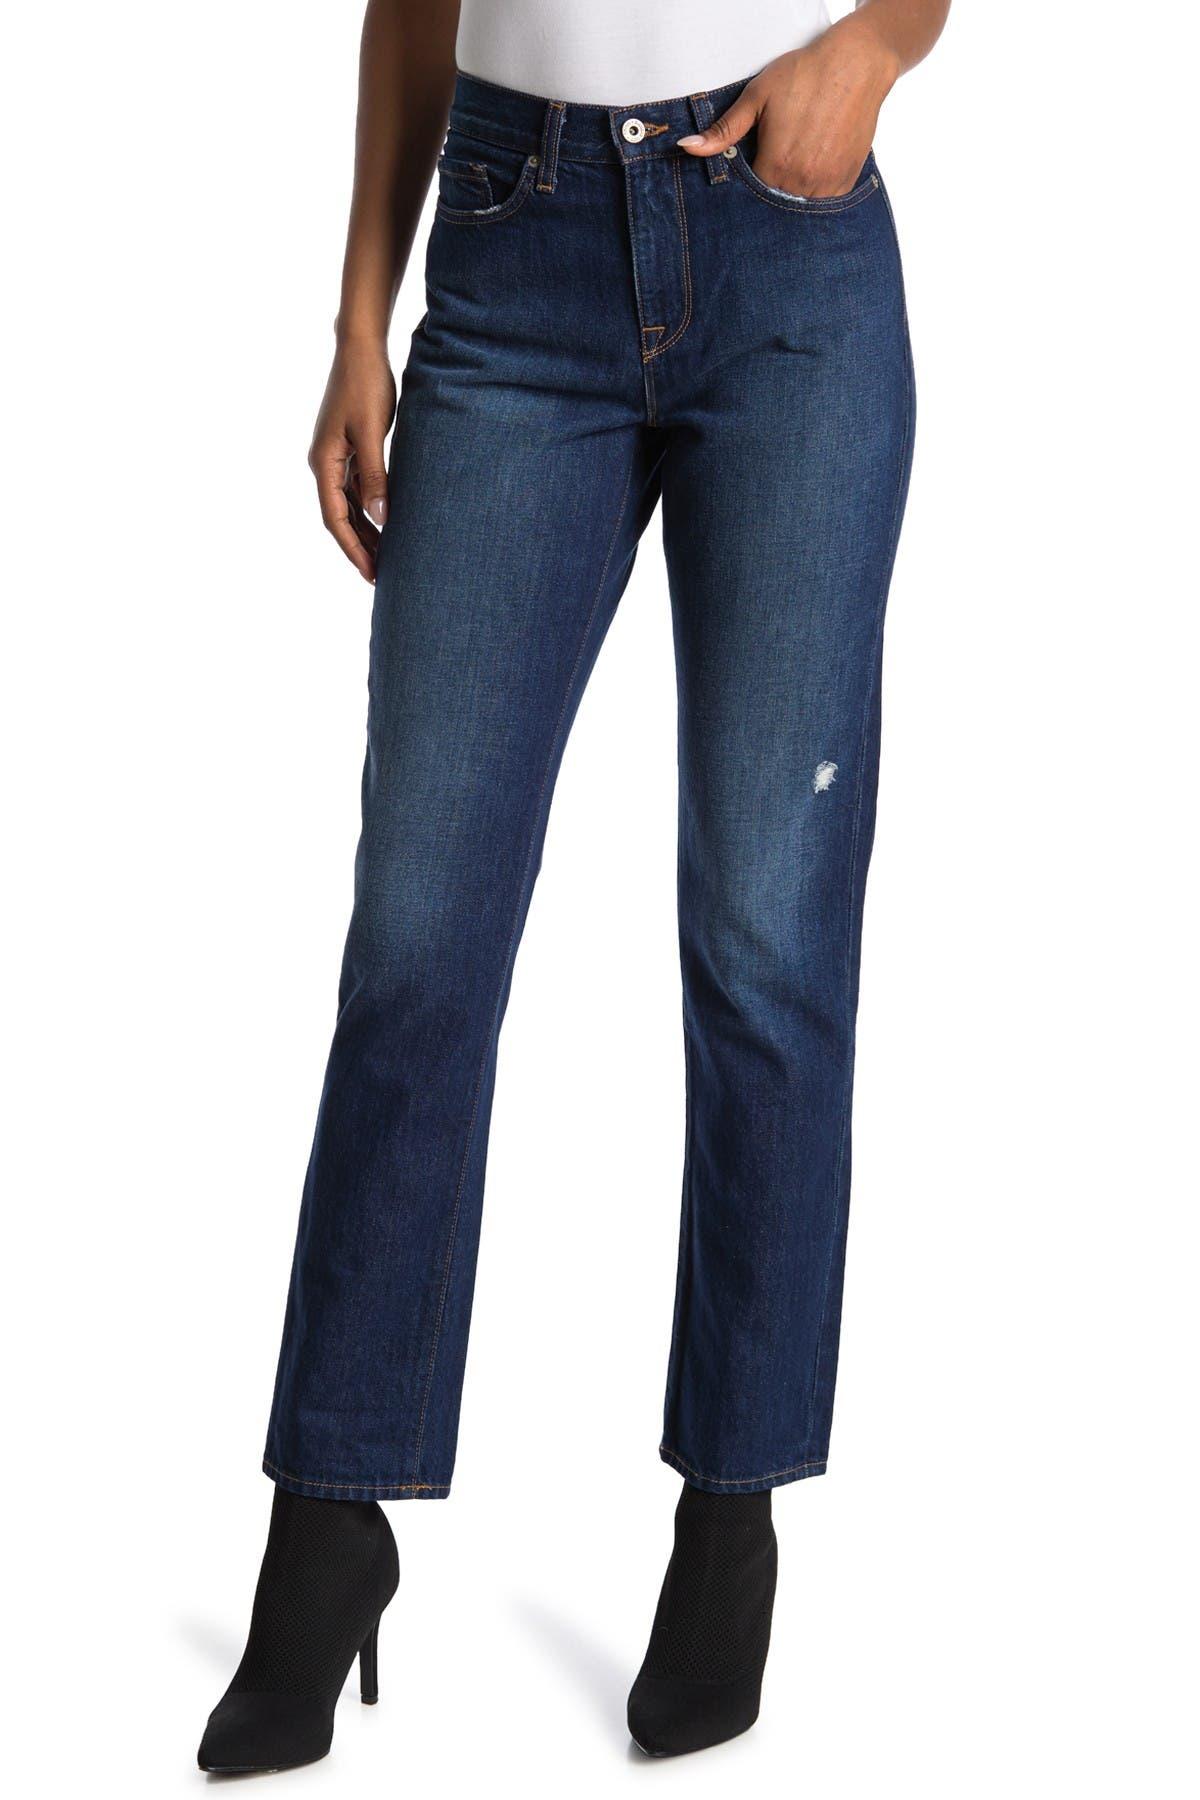 Image of BALDWIN Riley Straight Leg Jeans